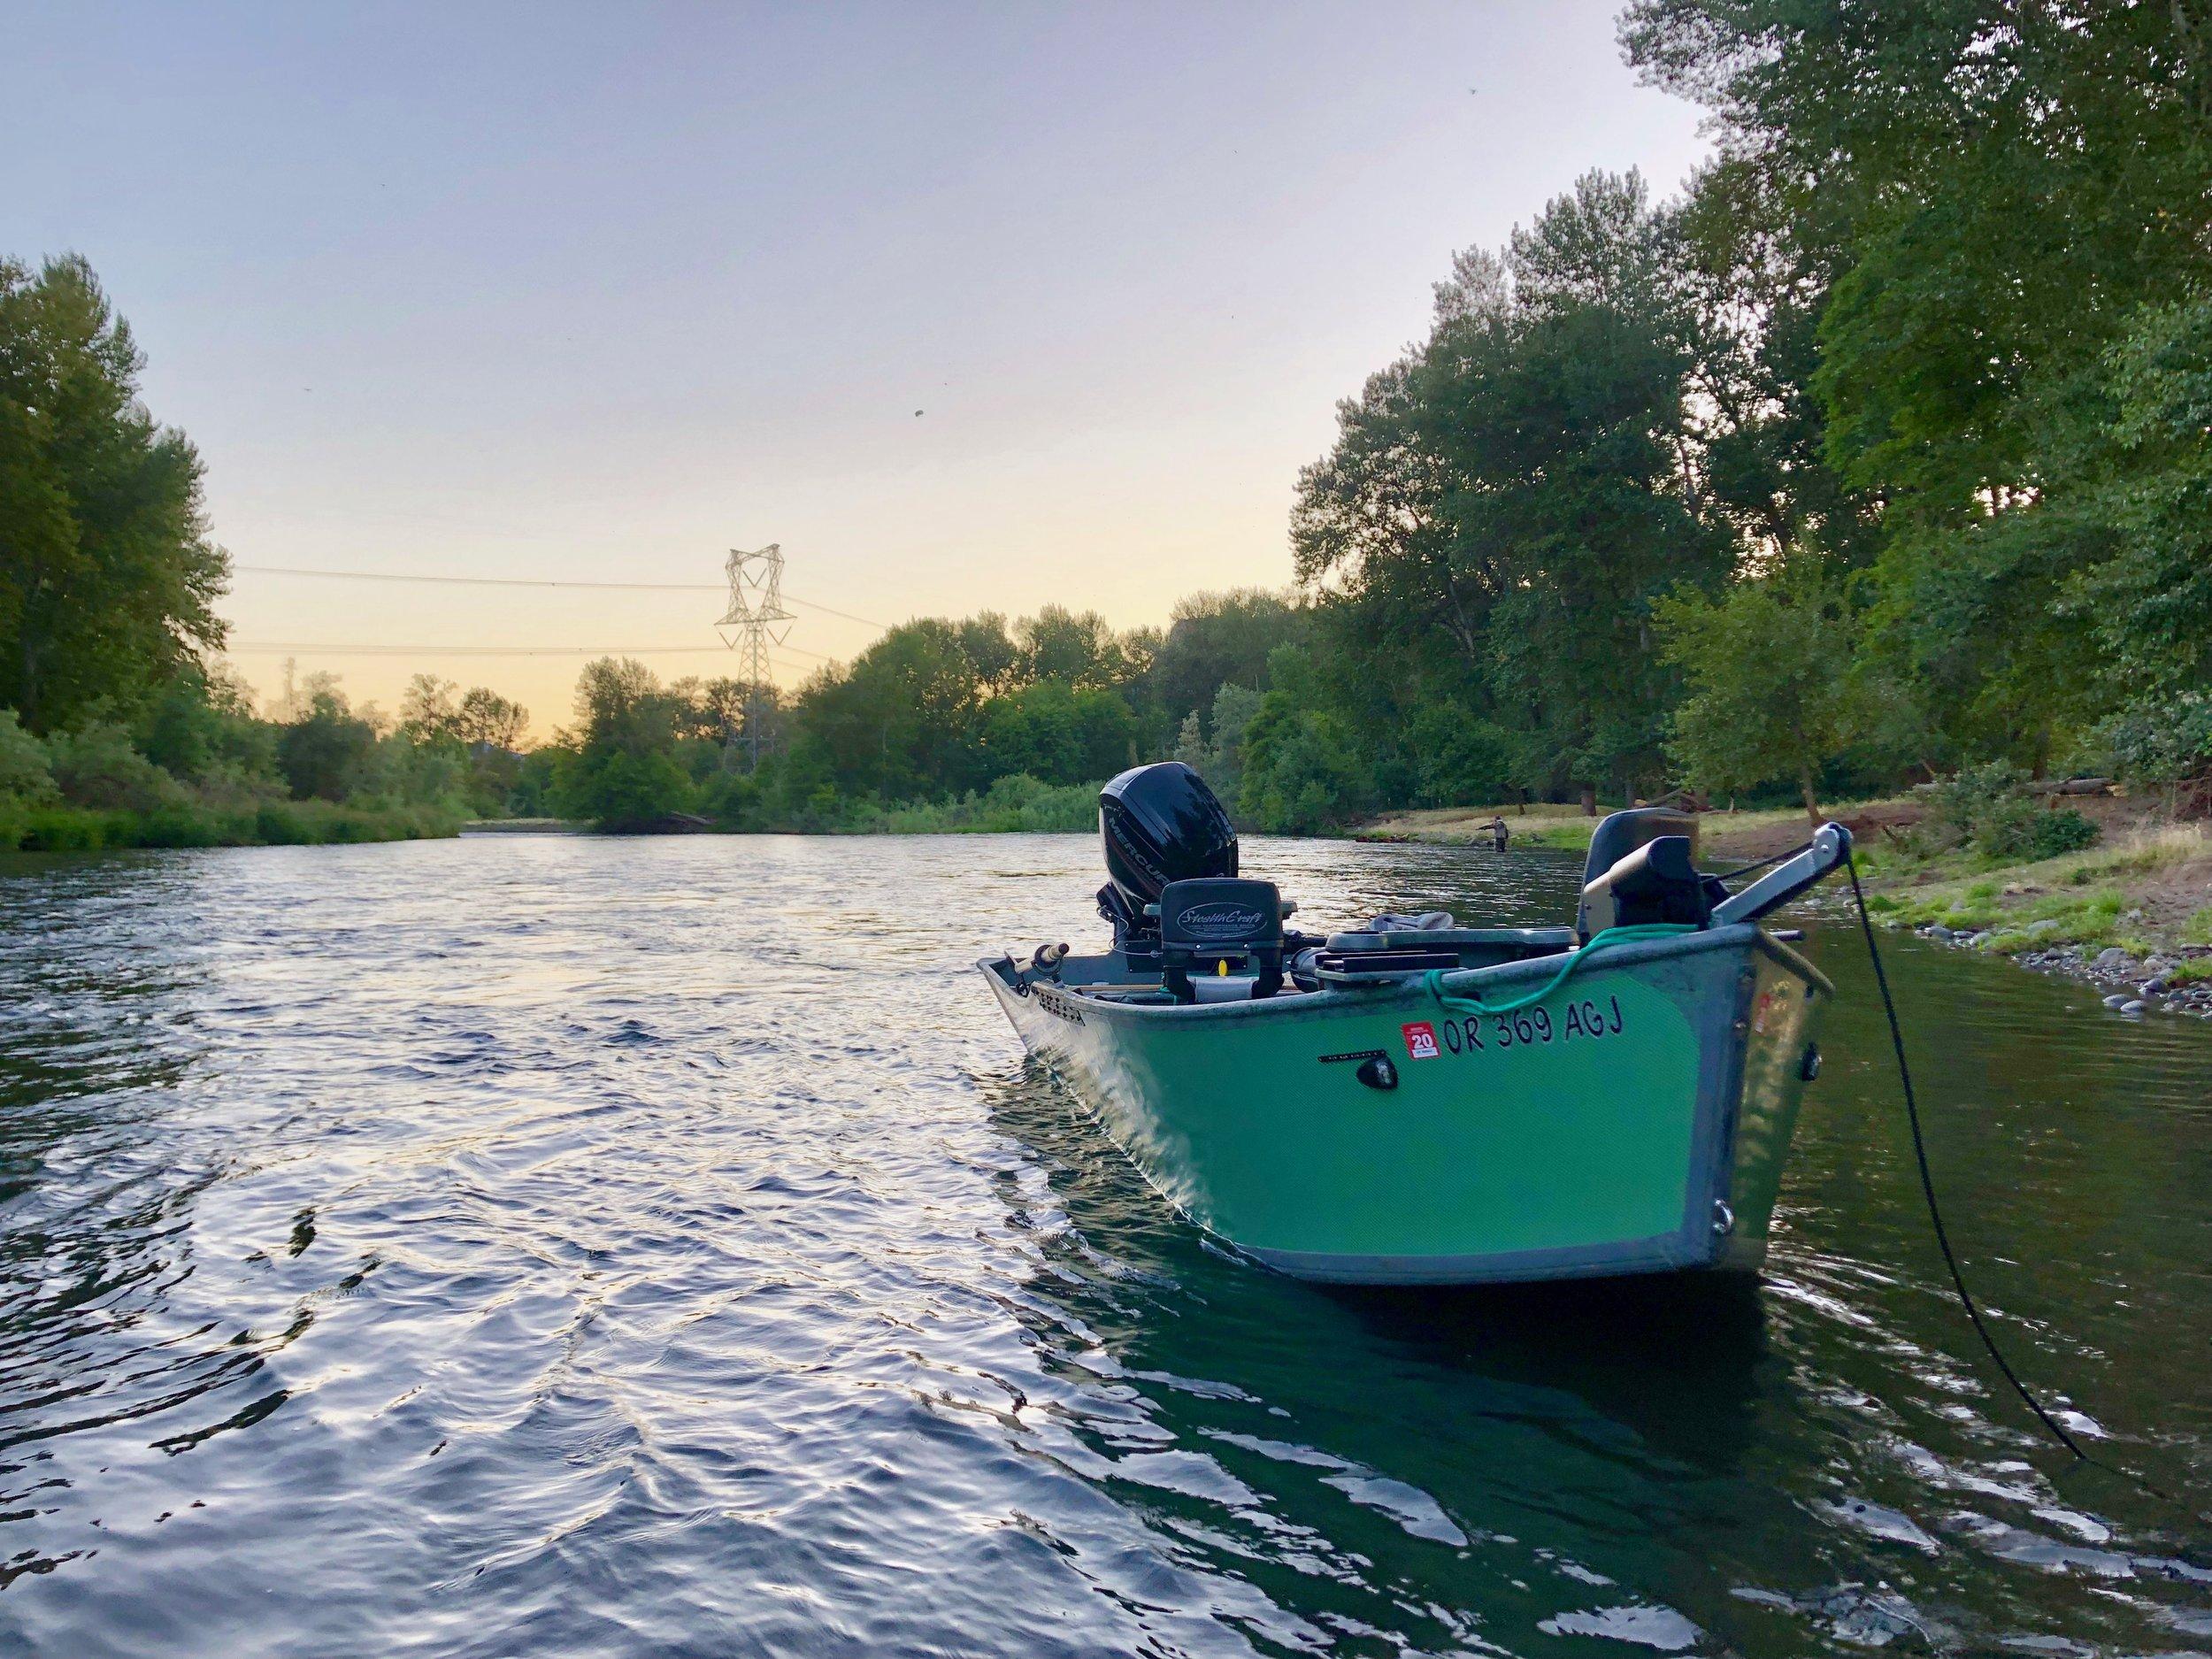 guided fishing trips in oregon